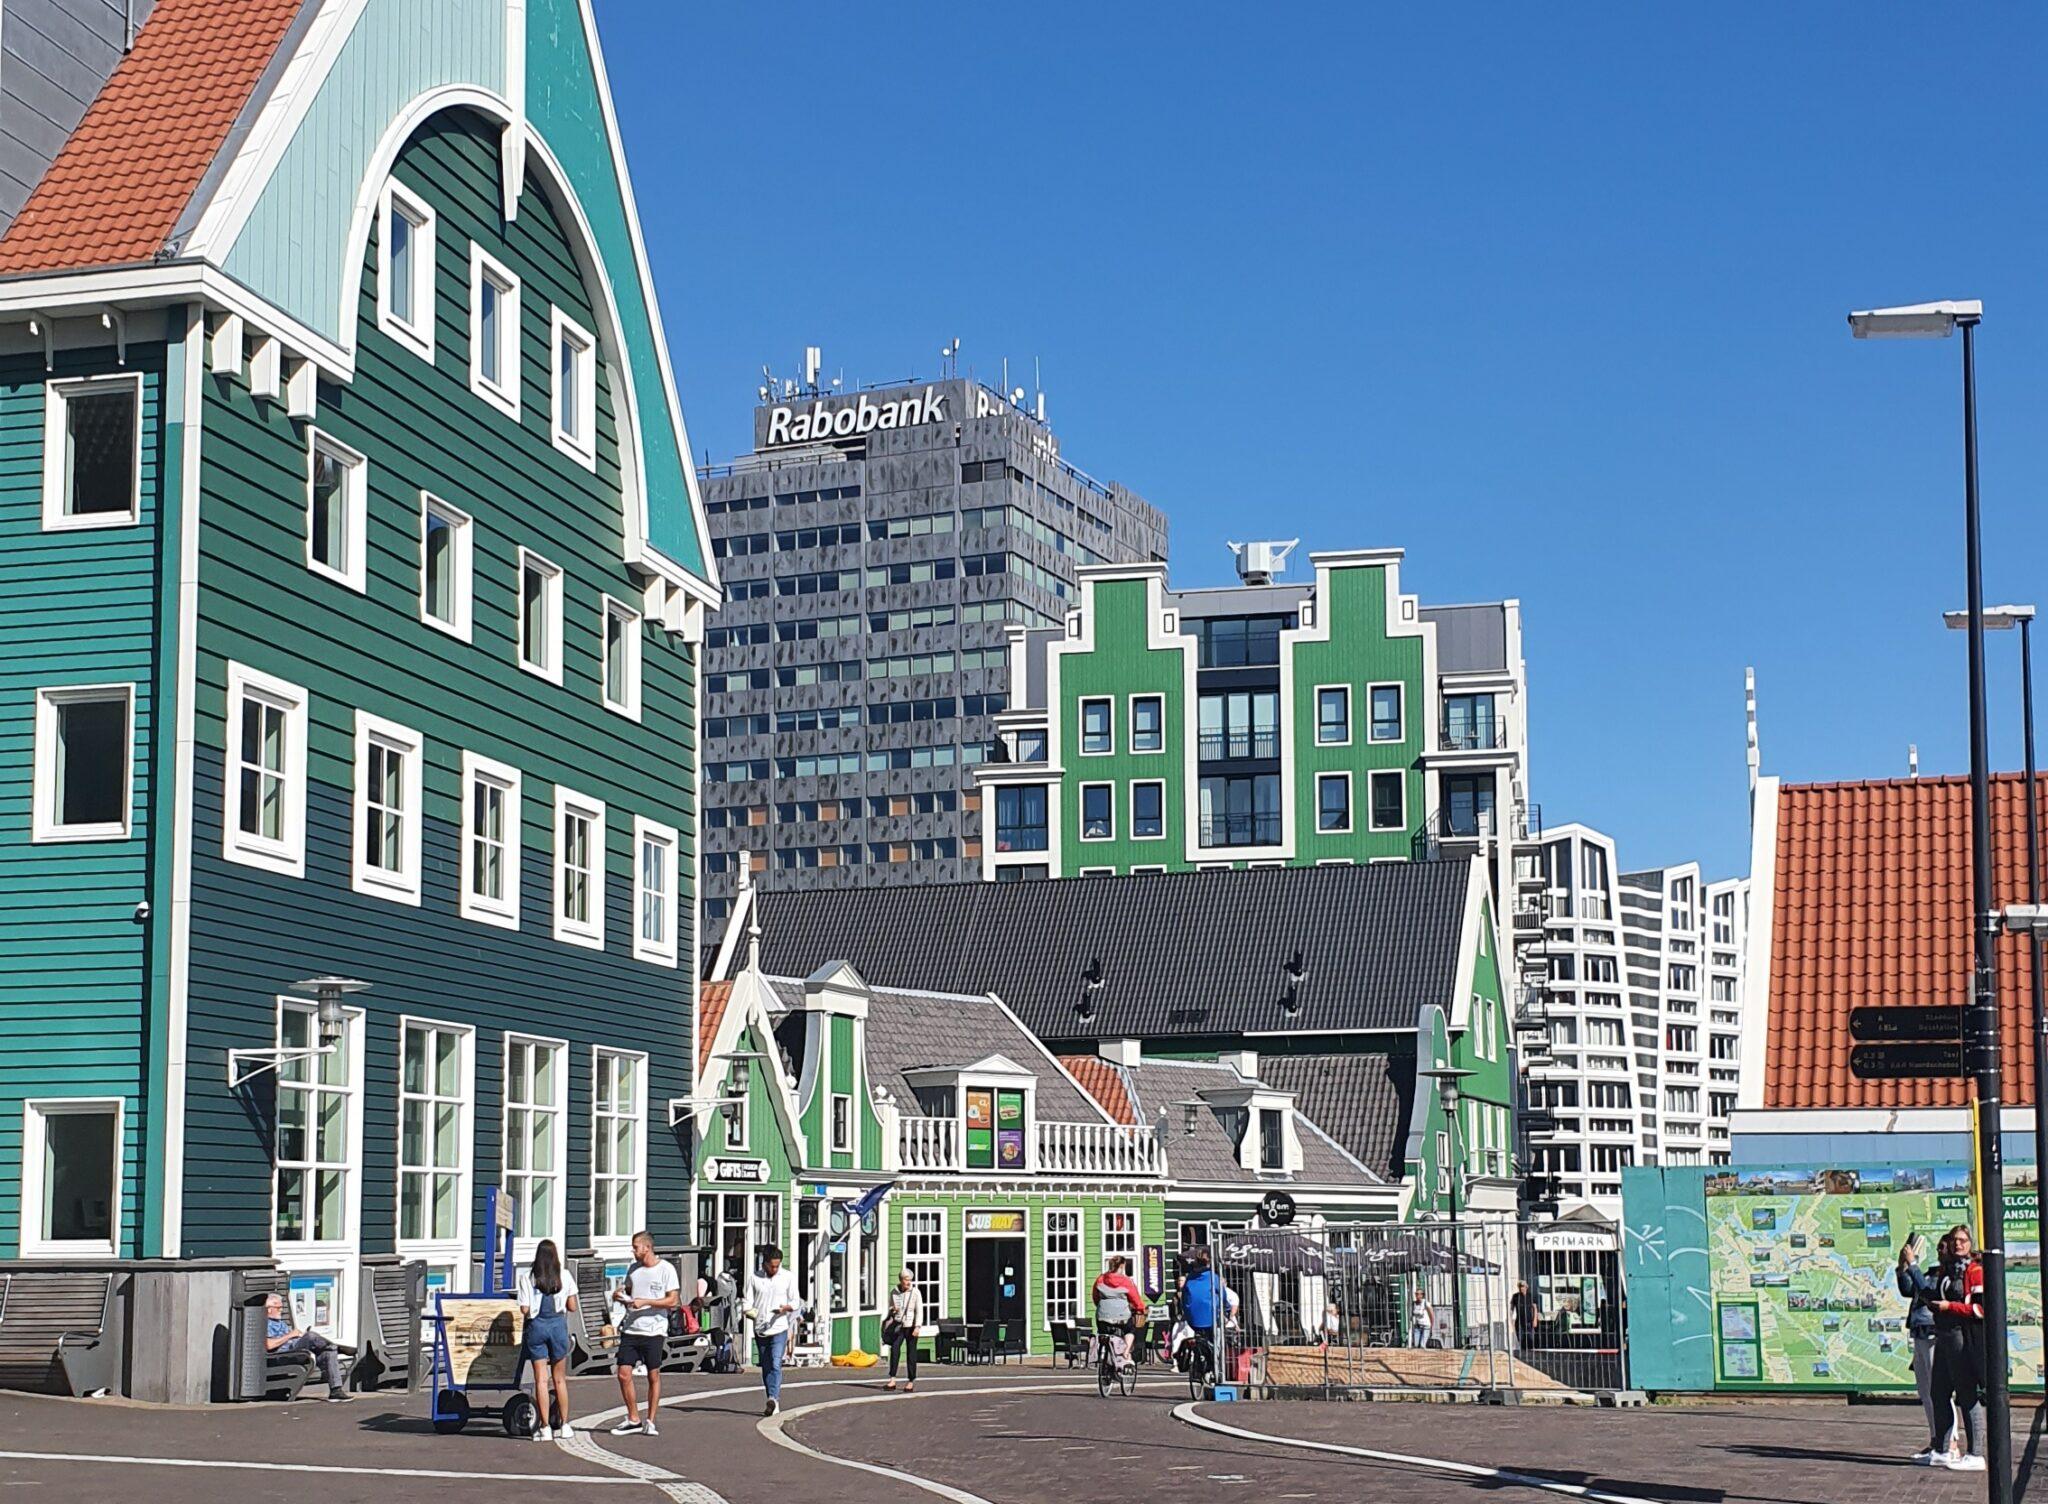 Bastion-Zaandam-1.-Onderschrift_-Zaanse-huisjes-in-Zaandam-_-Foto_-indebuurt